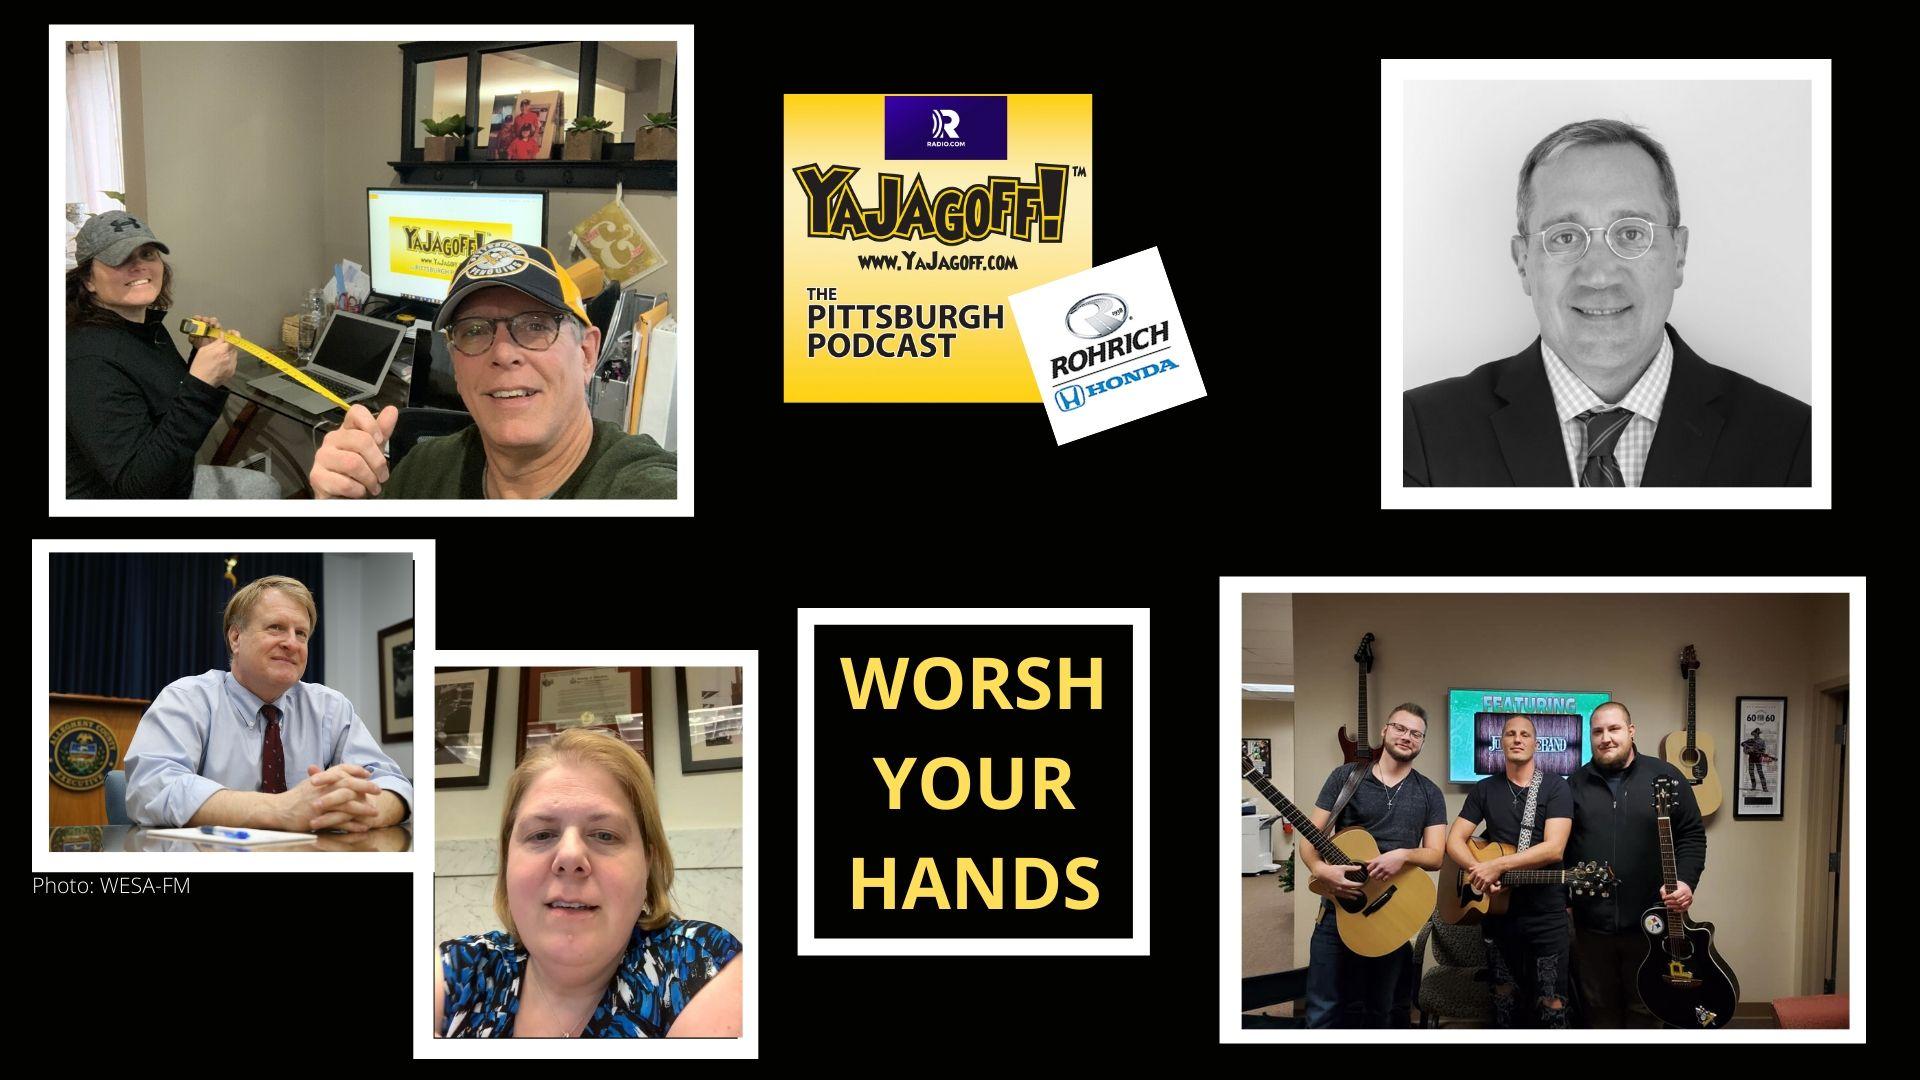 YaJagoff Podcast Coronavirus